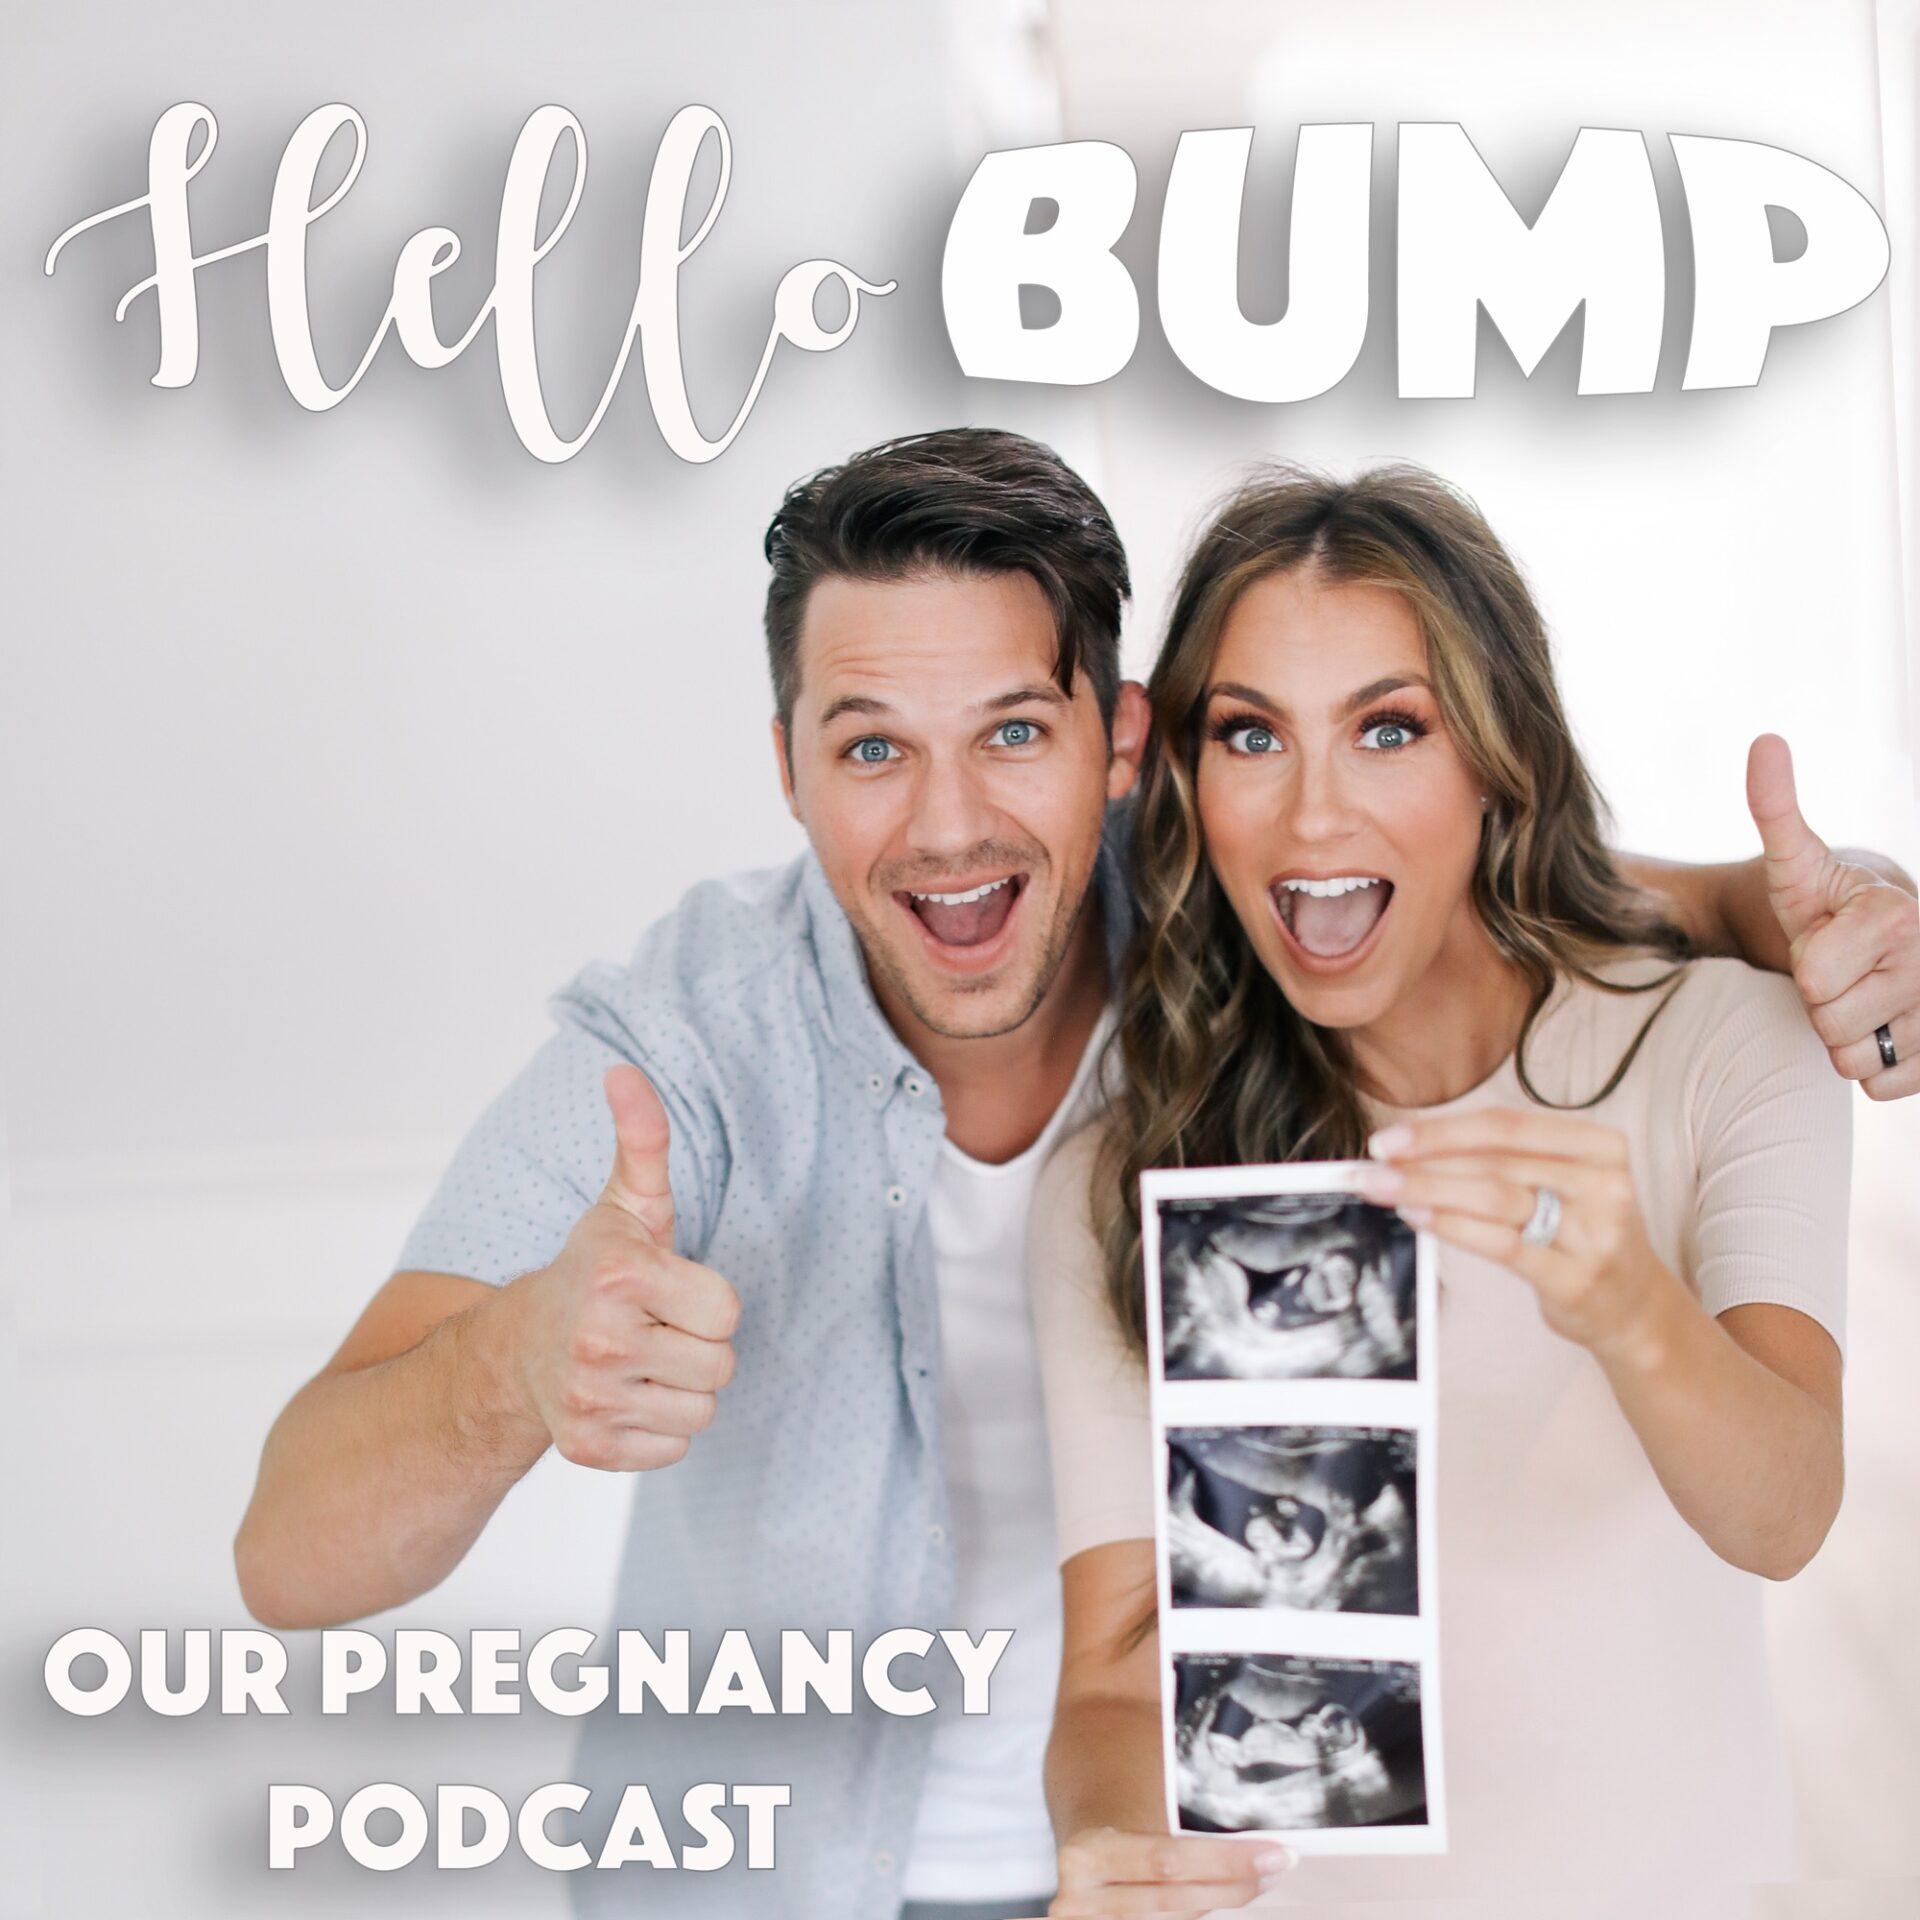 Hello Bump: Episode 12 + Bonus with Melissa & Justin Gaston